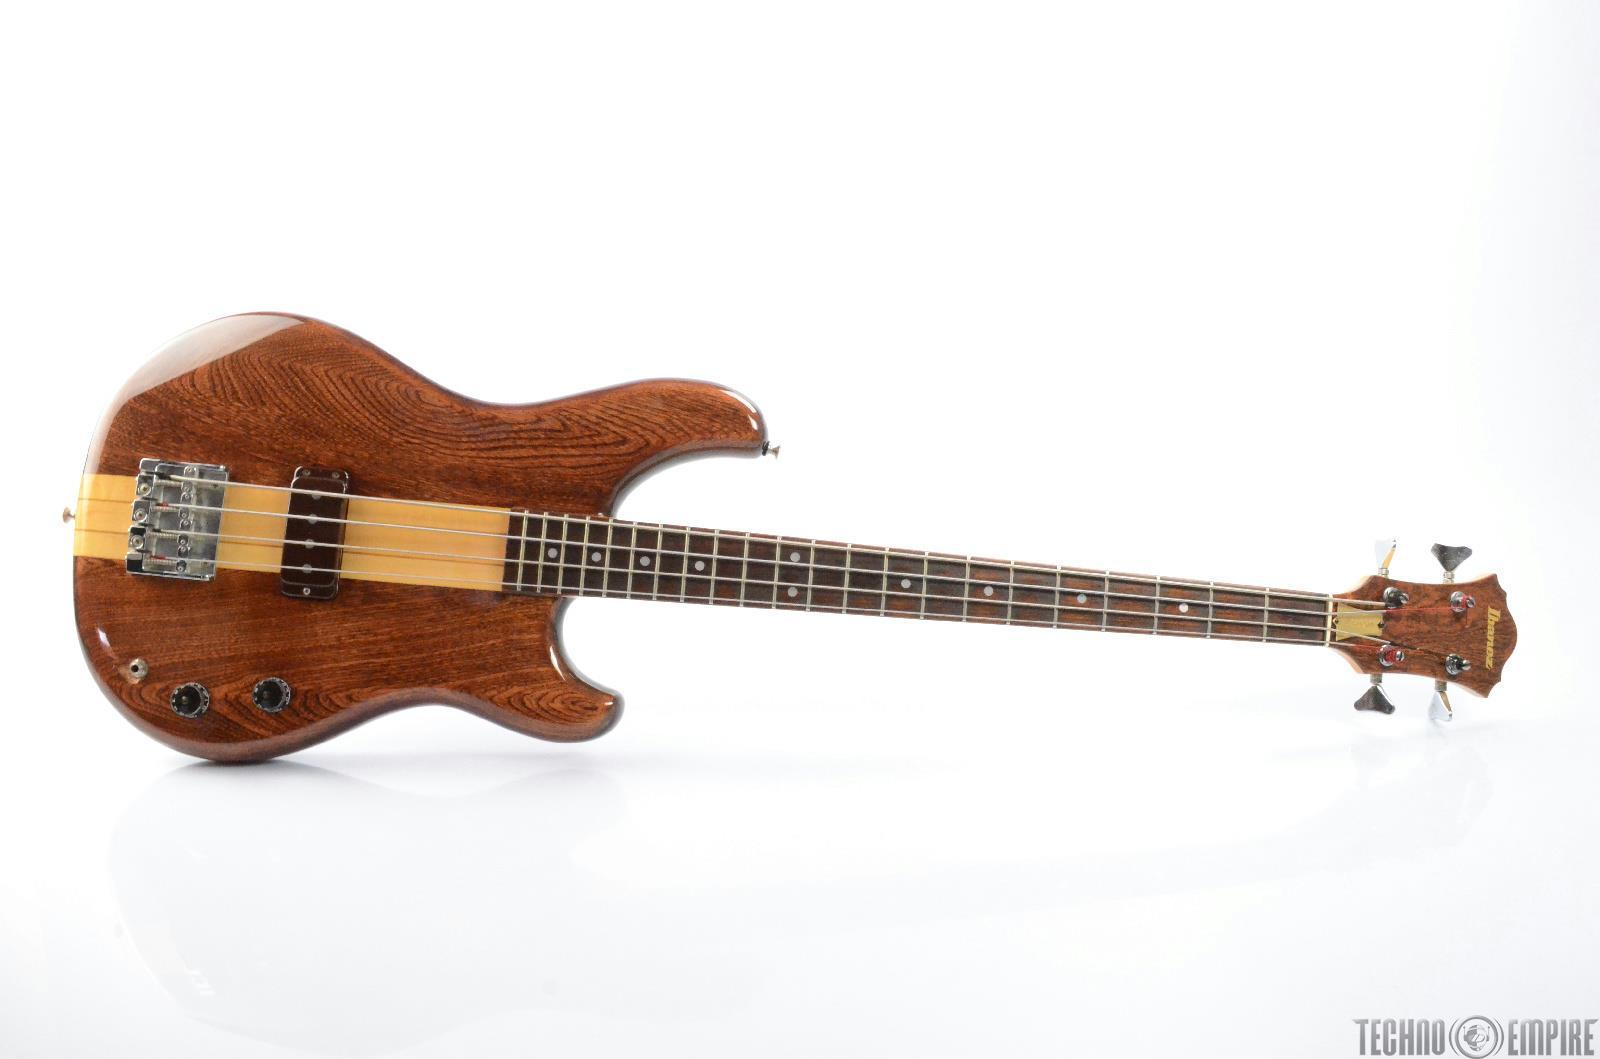 1979 IBANEZ MC-800 Musician 4-String Electric Bass Guitar w/ Hard Case #26338